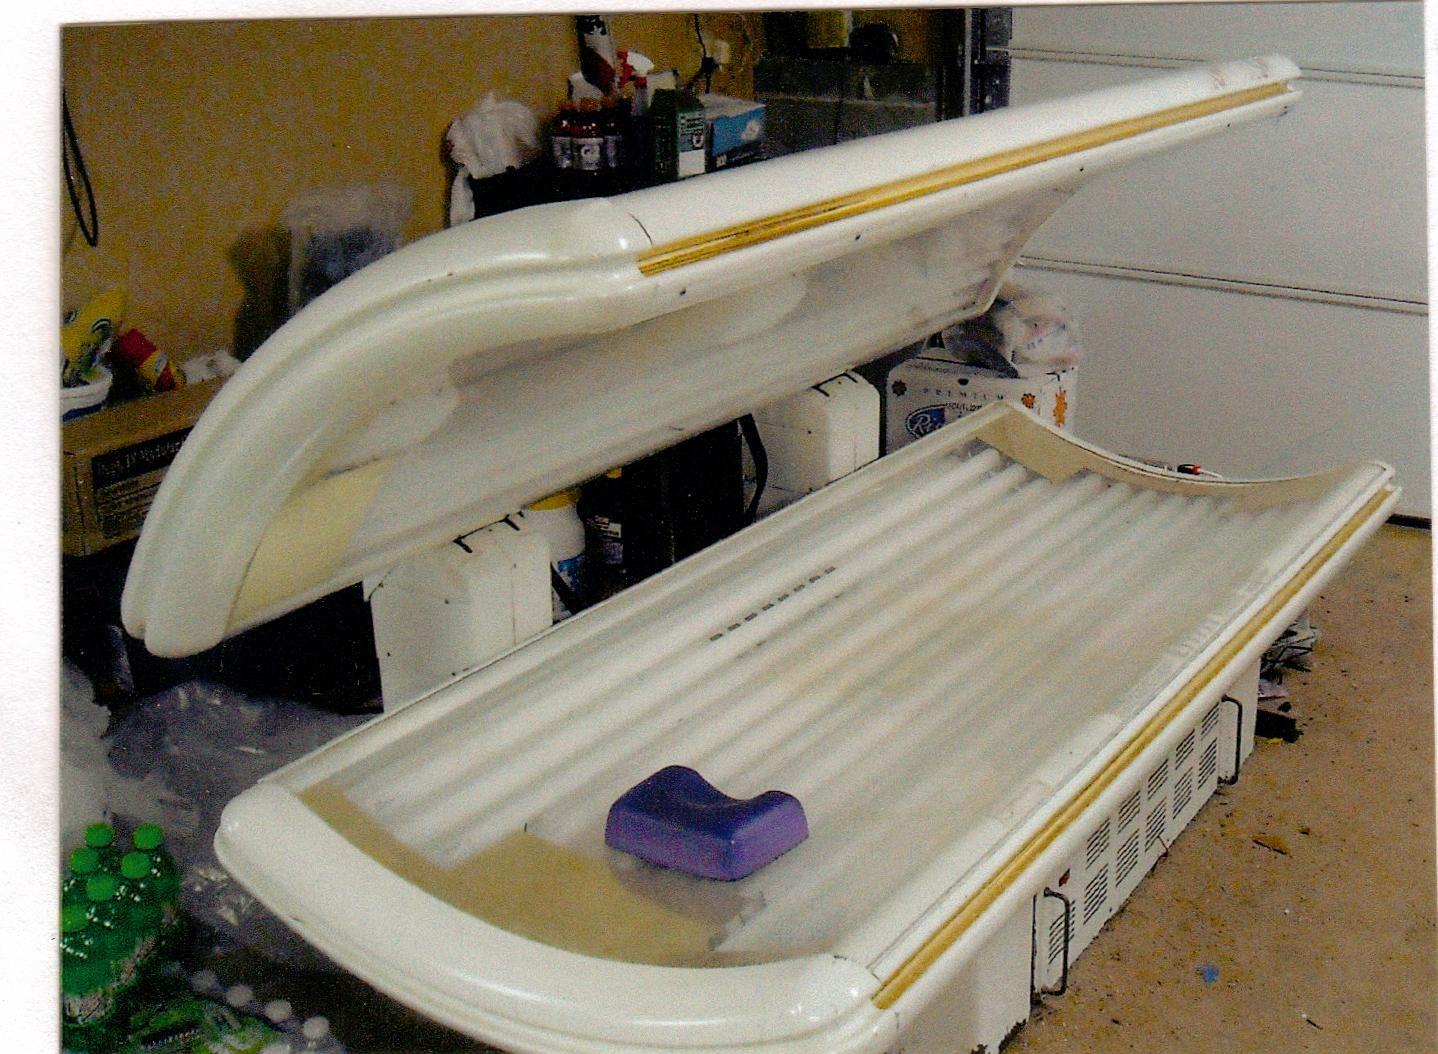 a bloomington matrix bed for indiana equipment beds matt total sale tan tanning